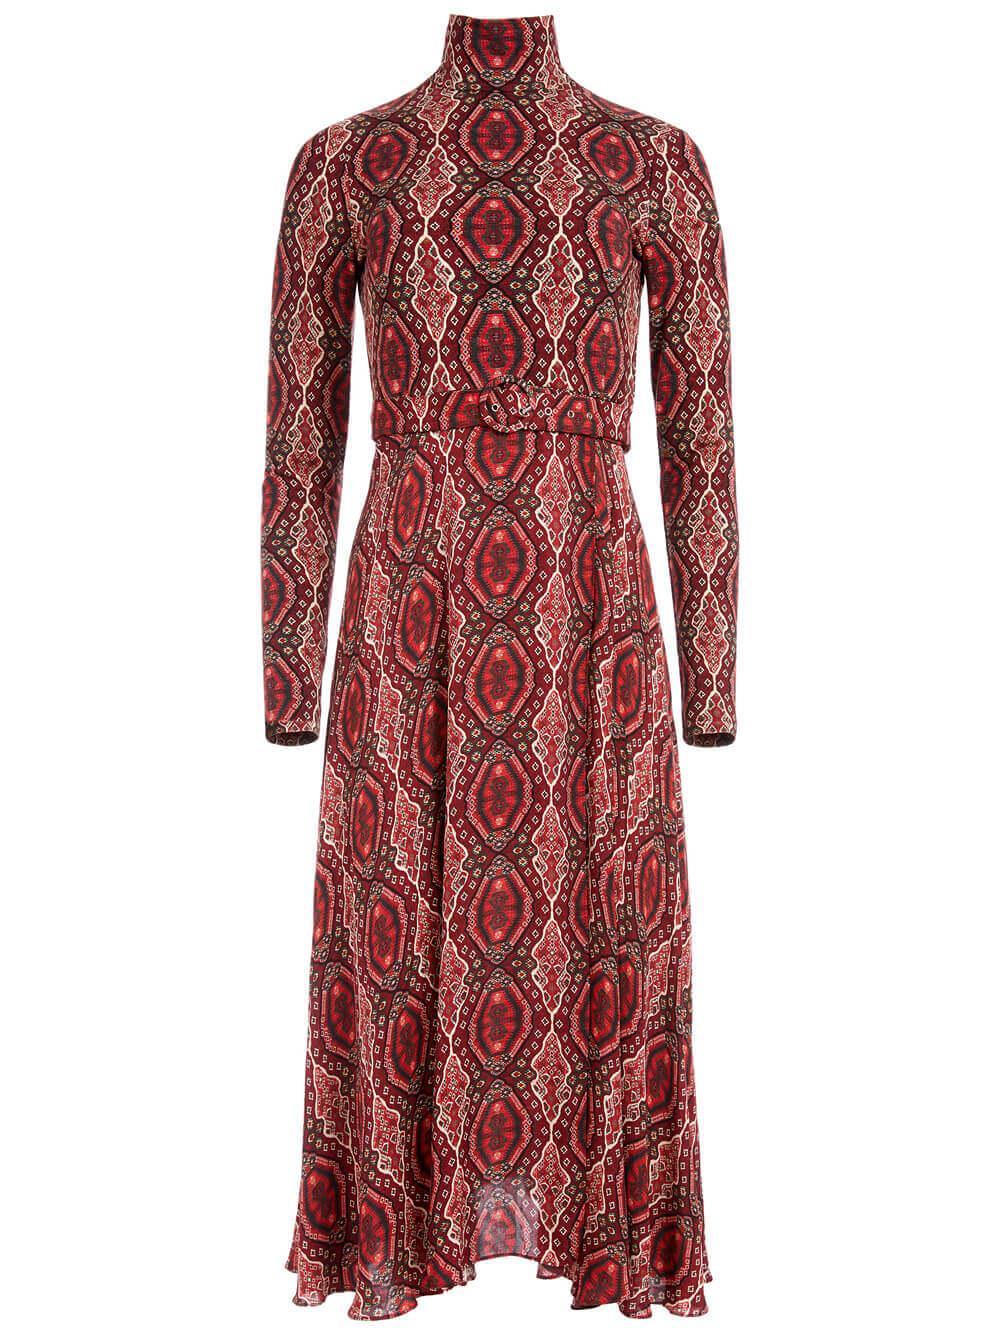 Clare Turtleneck Dress